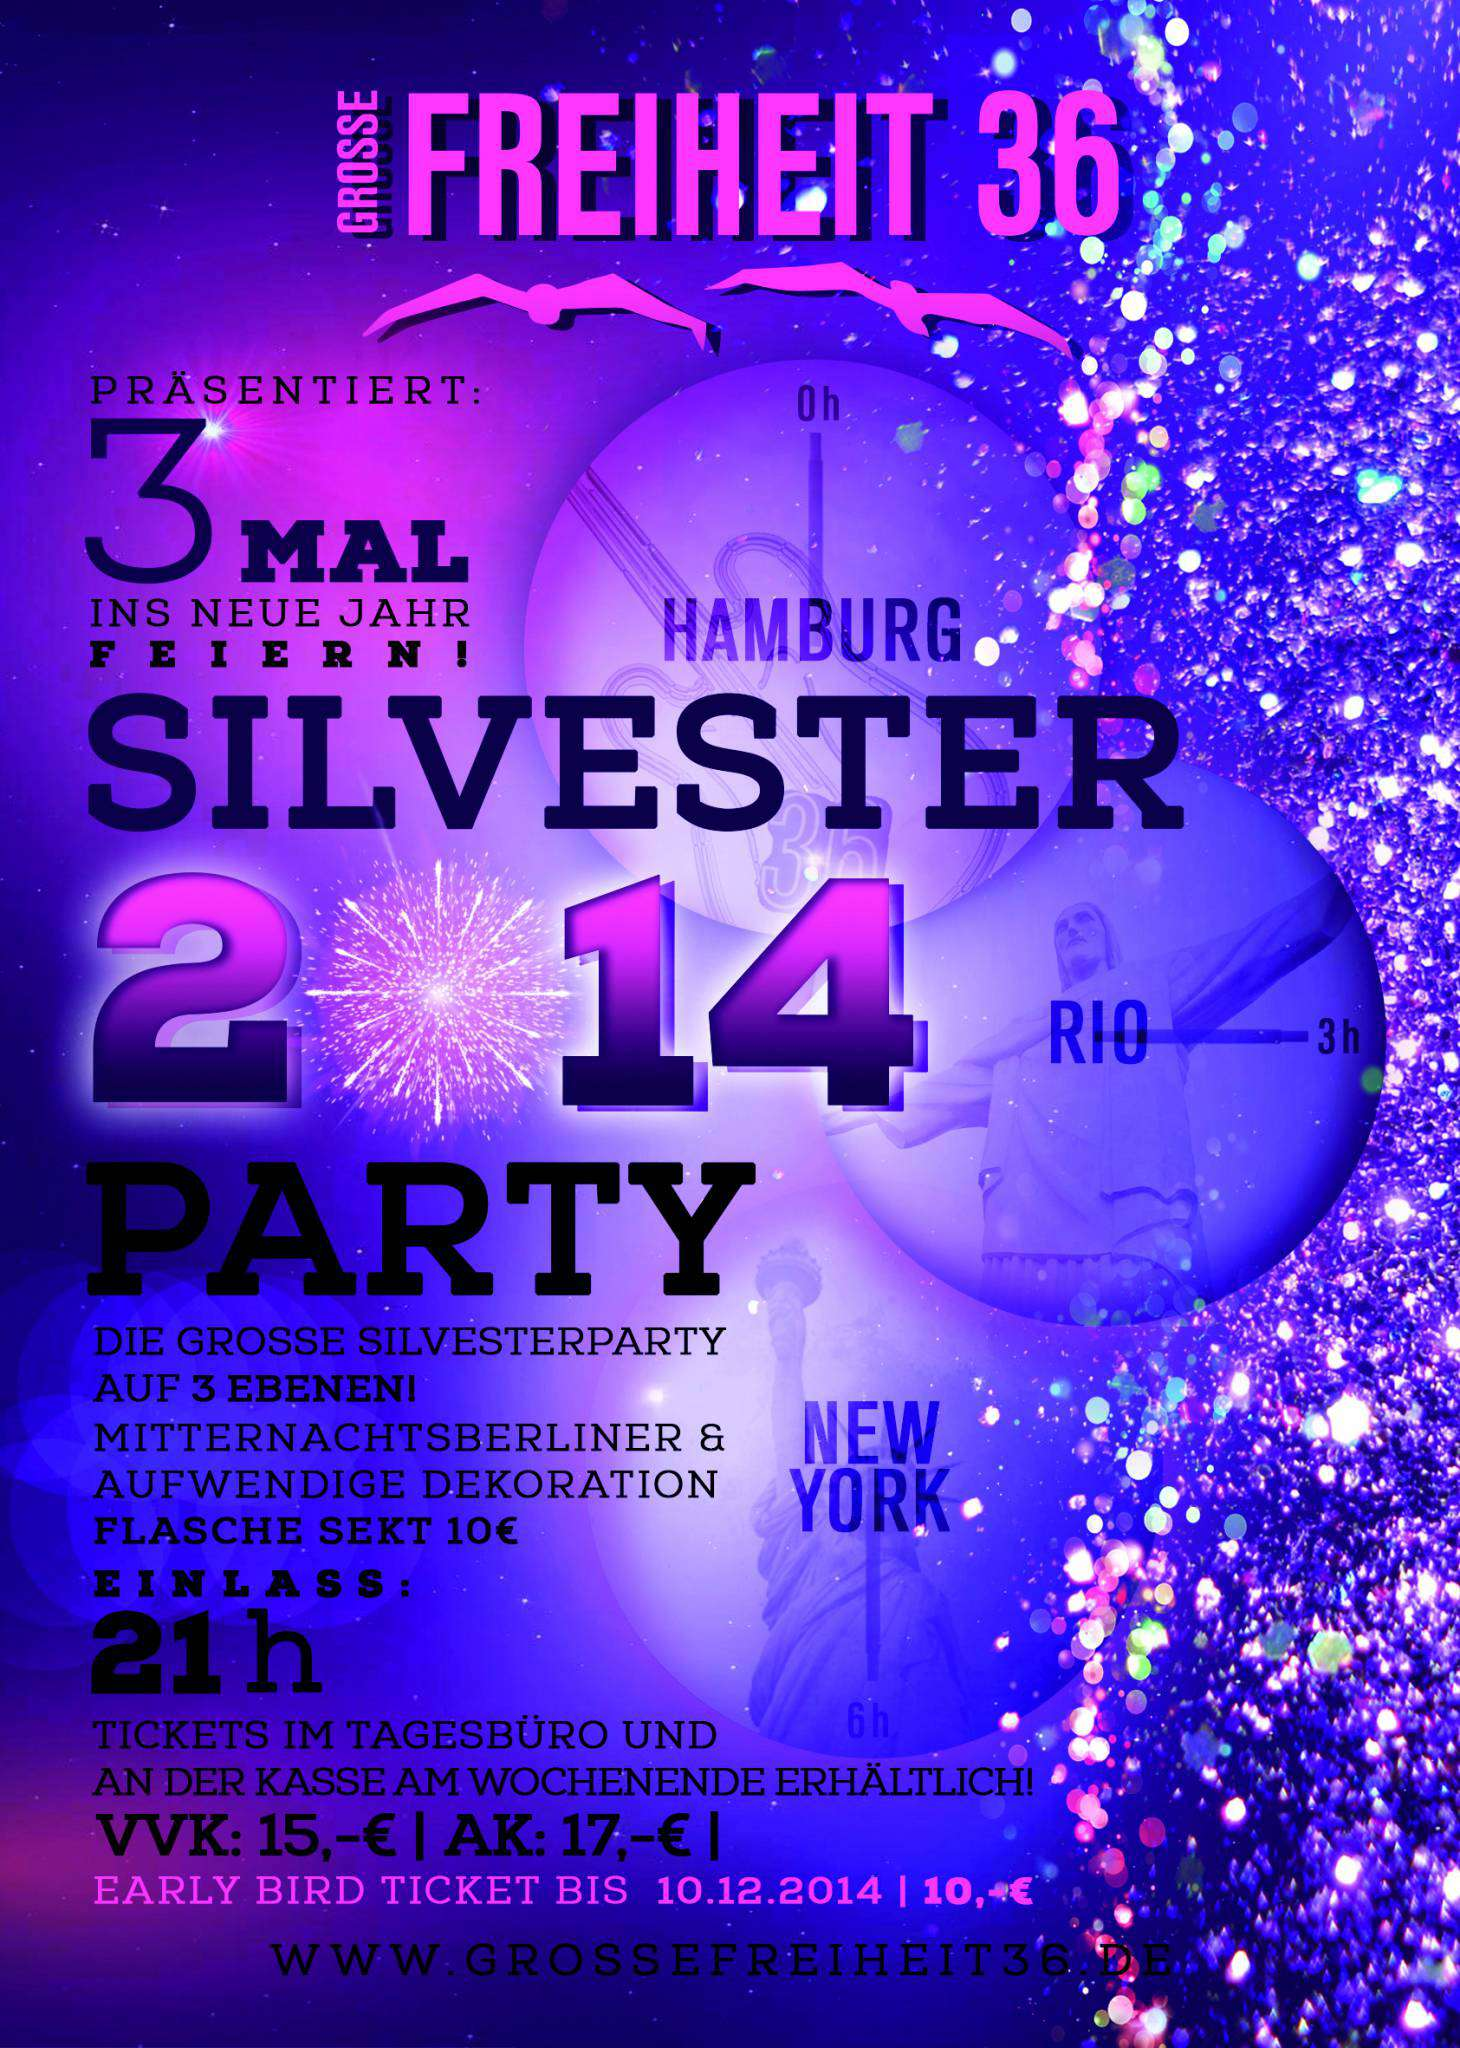 Silvester 2014 hamburg single party